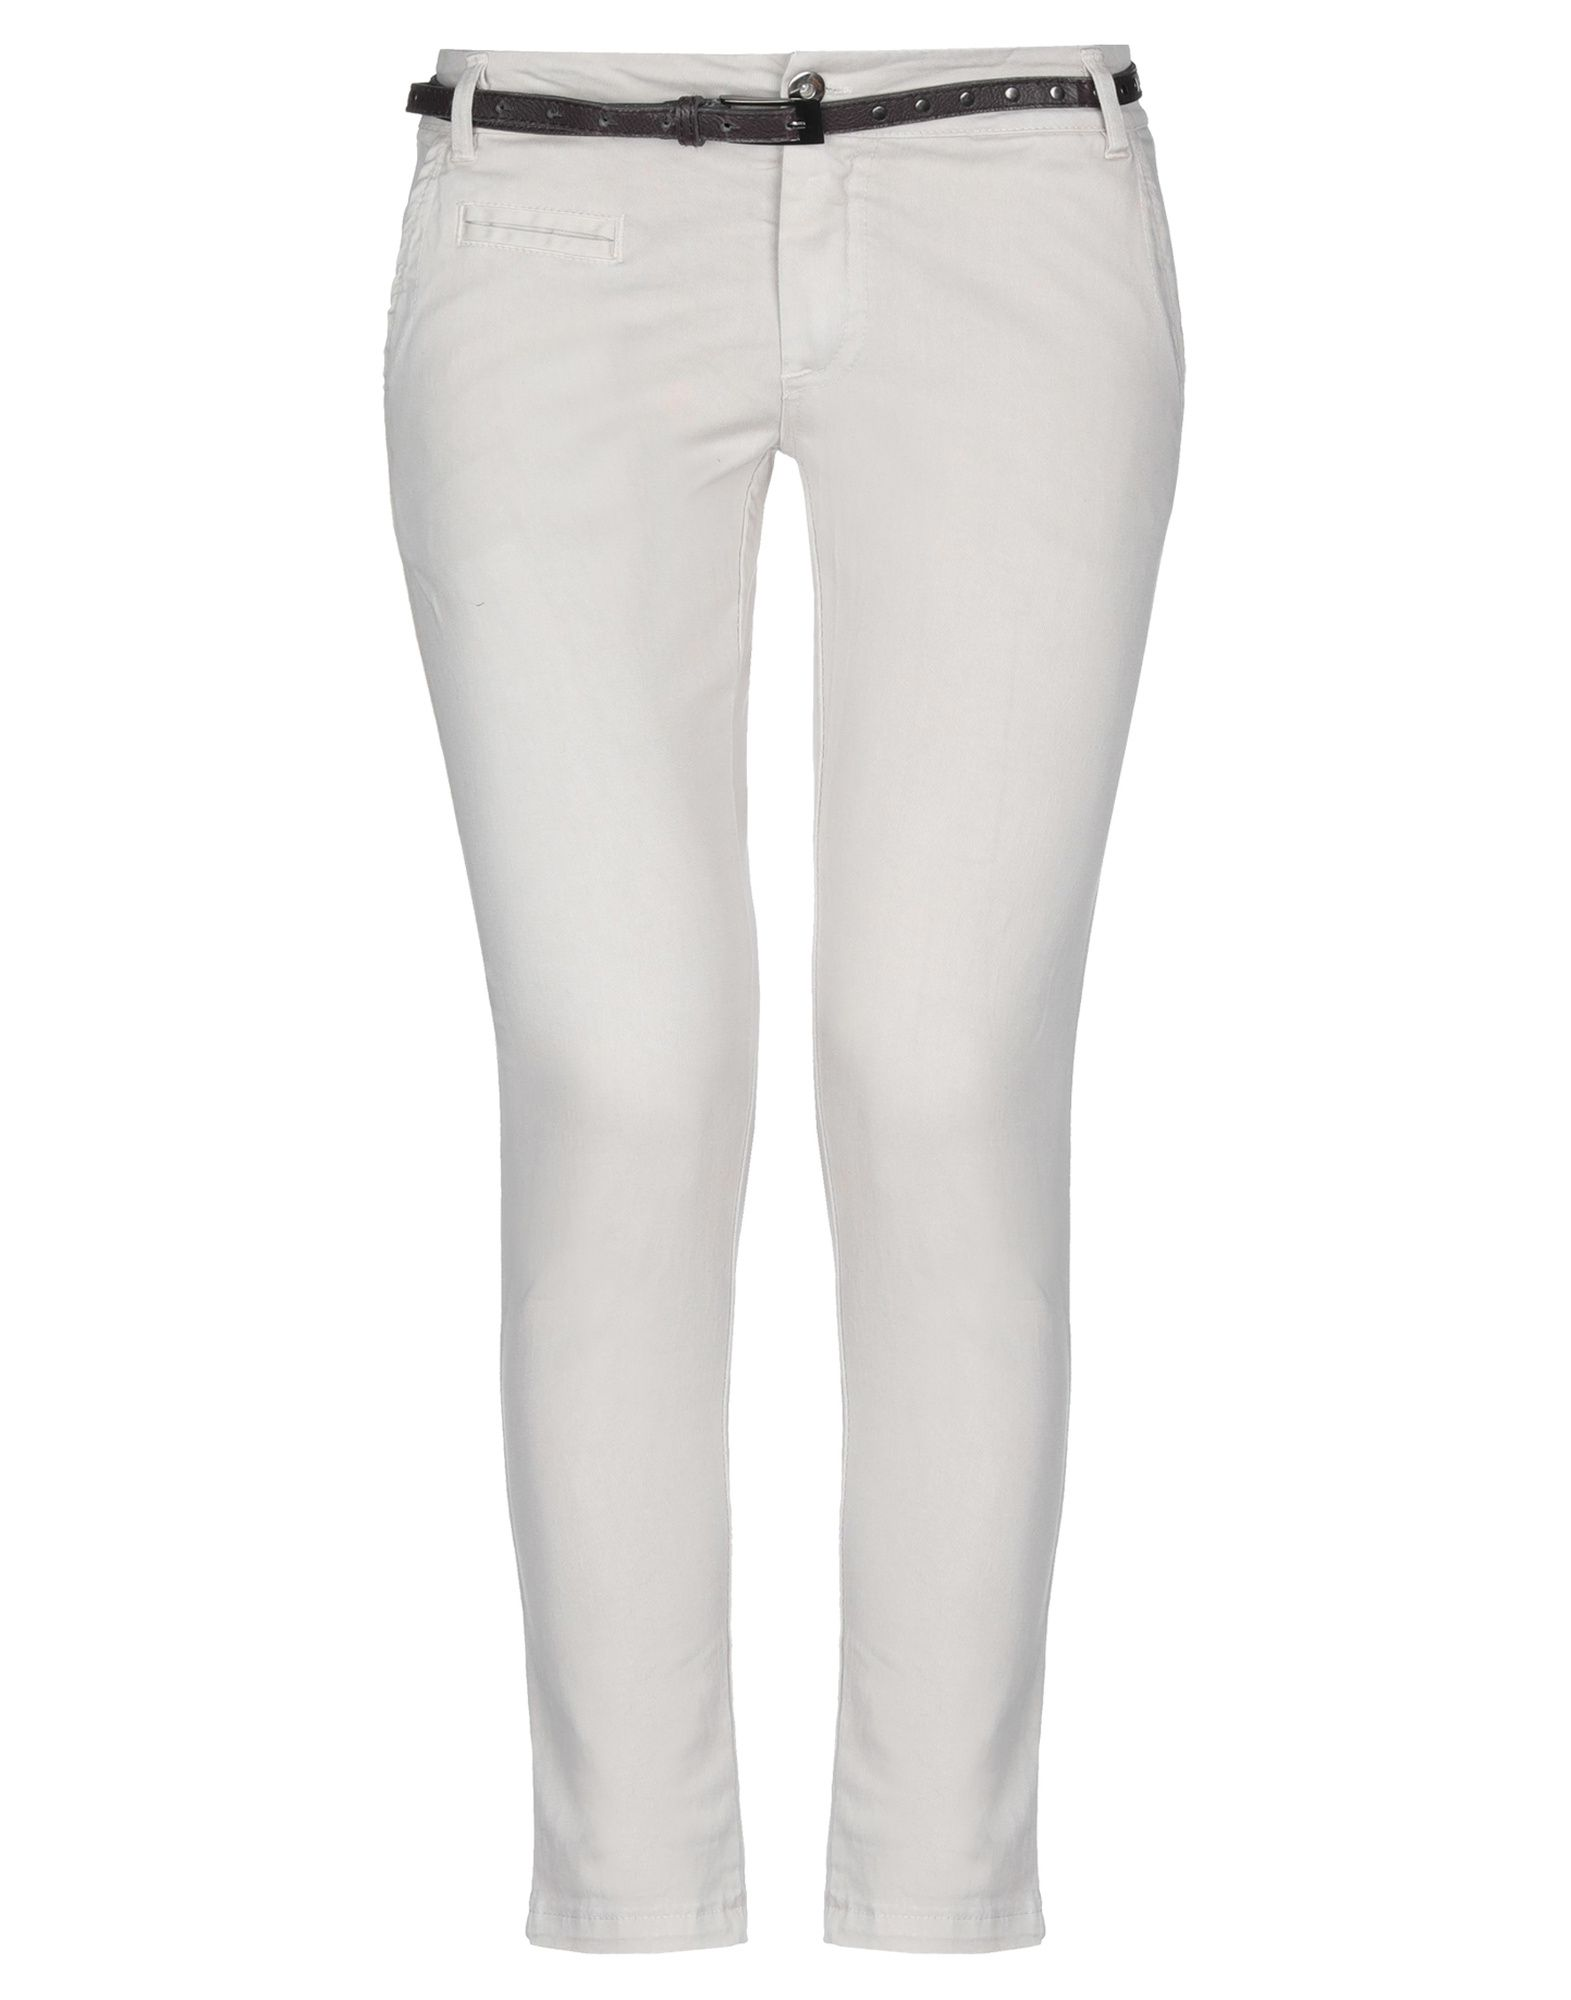 WIL DEMULDER London Повседневные брюки цены онлайн